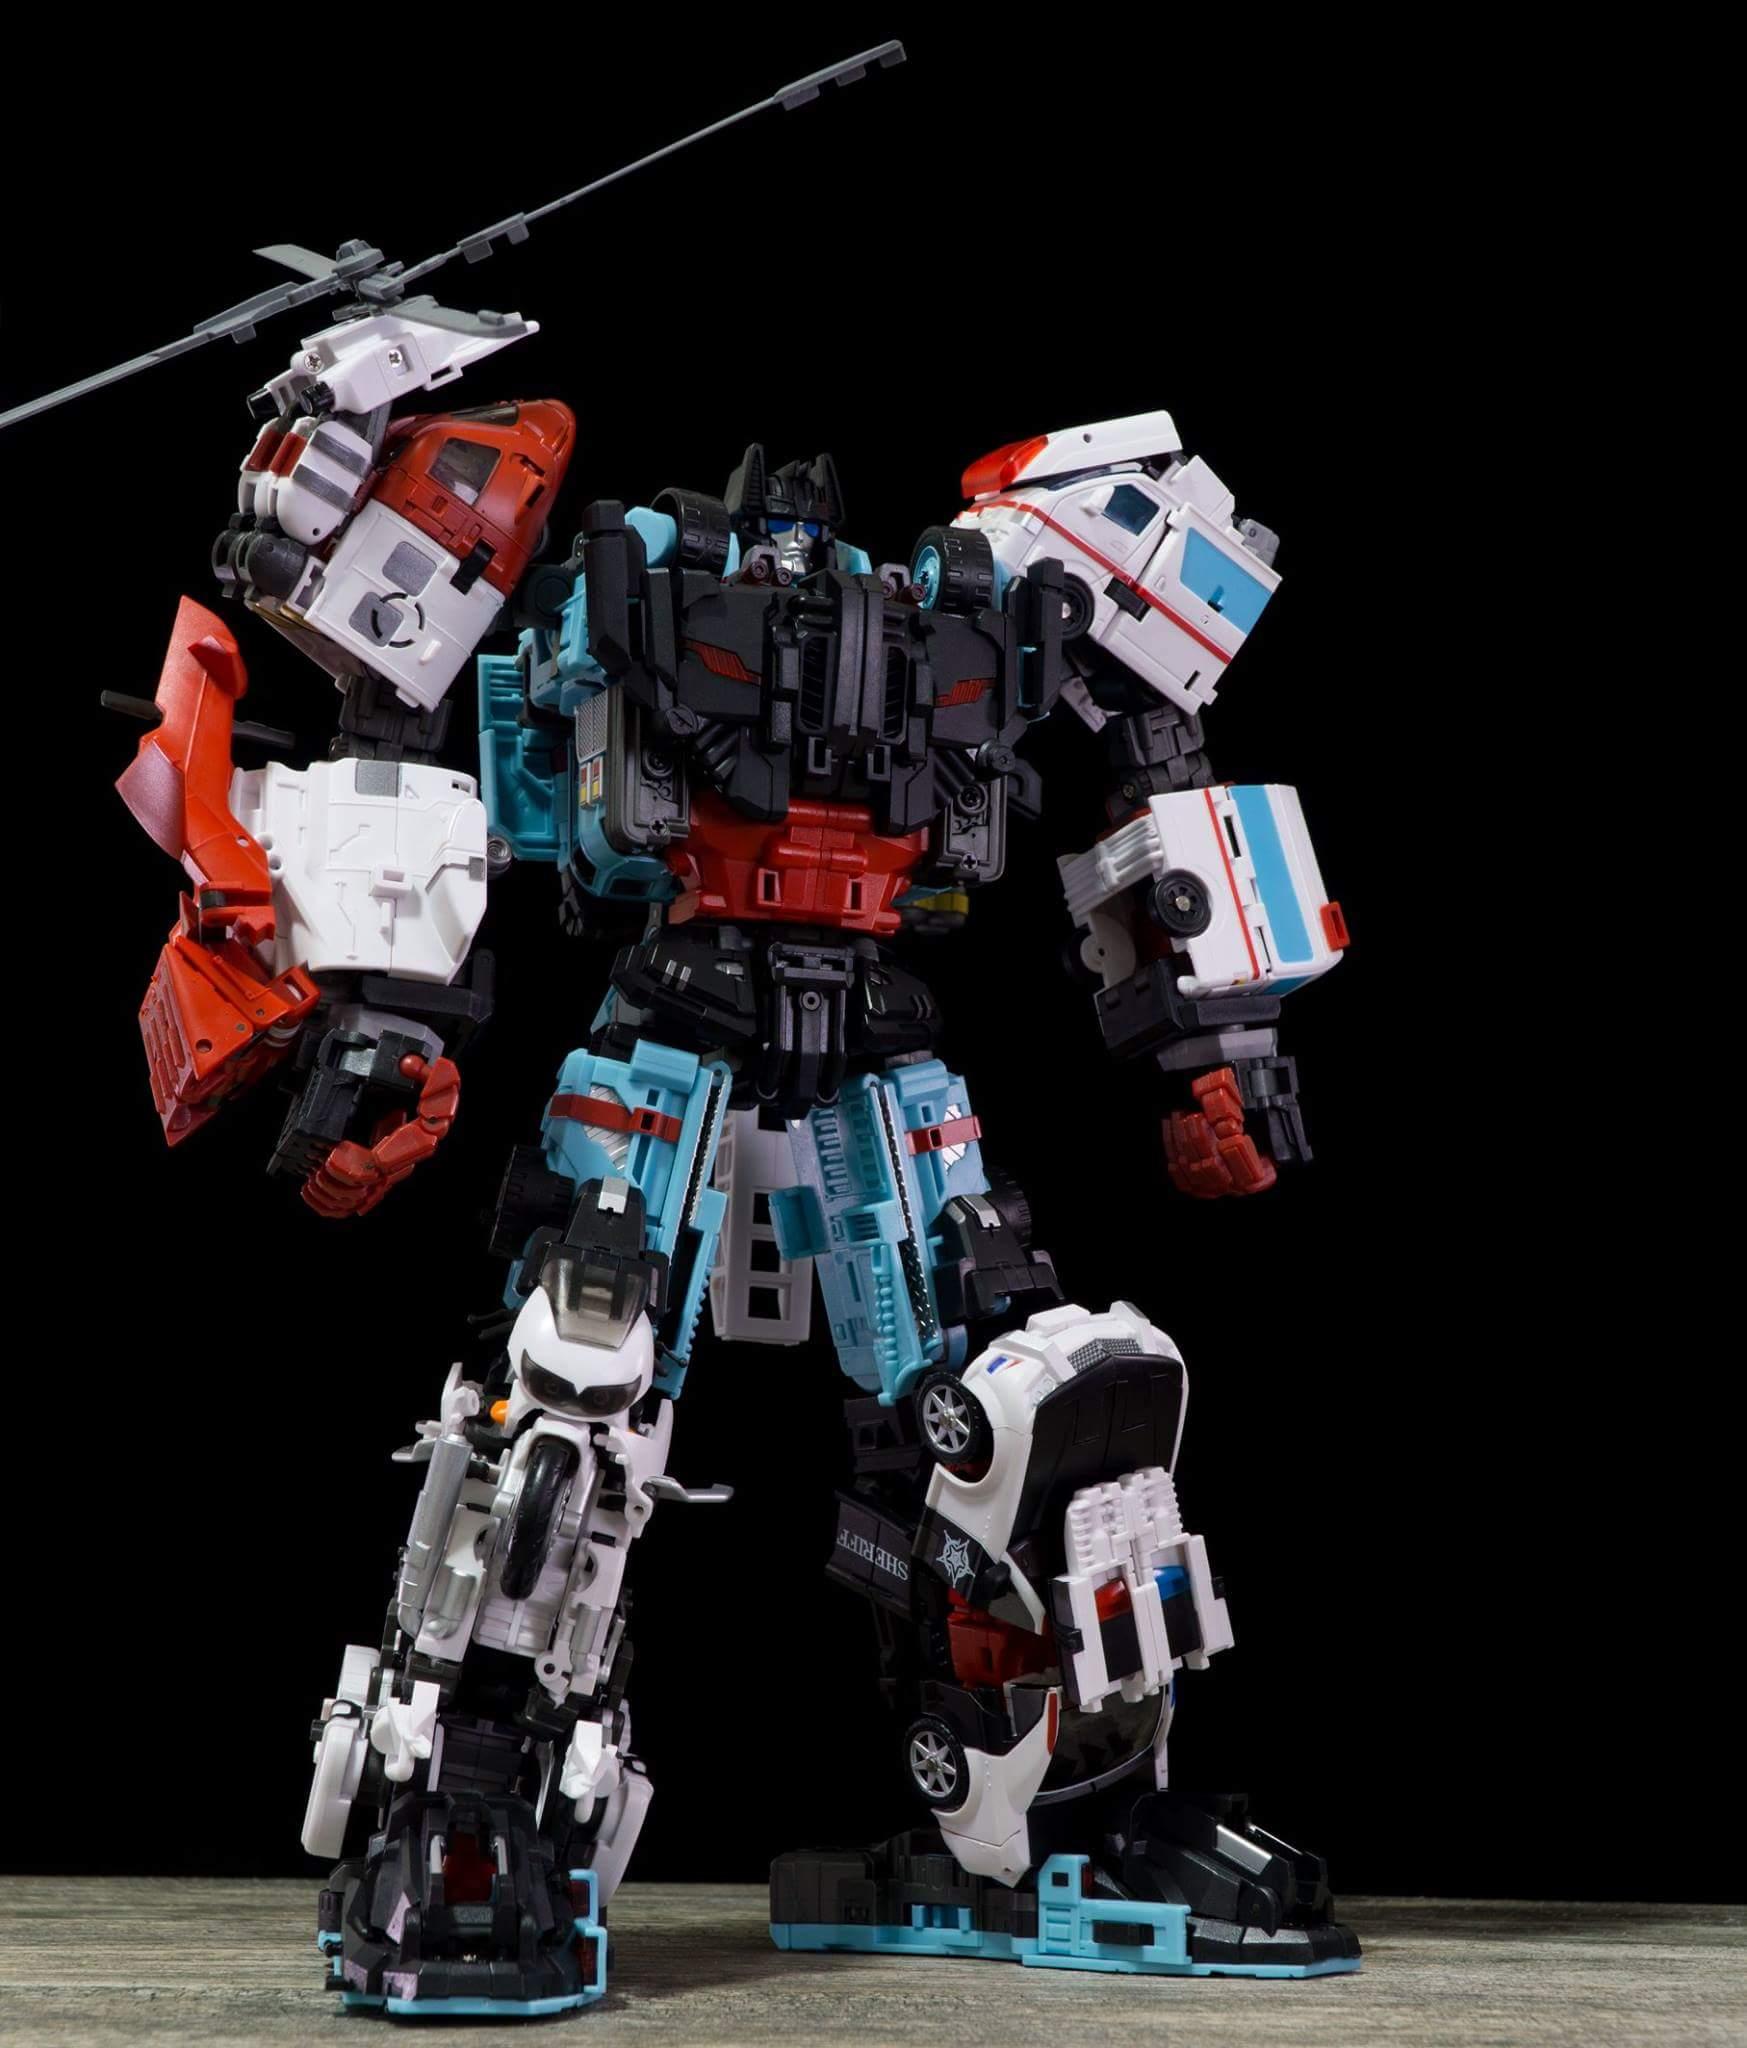 [MakeToys] Produit Tiers - Jouet MTCM-04 Guardia (aka Protectobots - Defensor/Defenso) - Page 4 UUEl7cEg